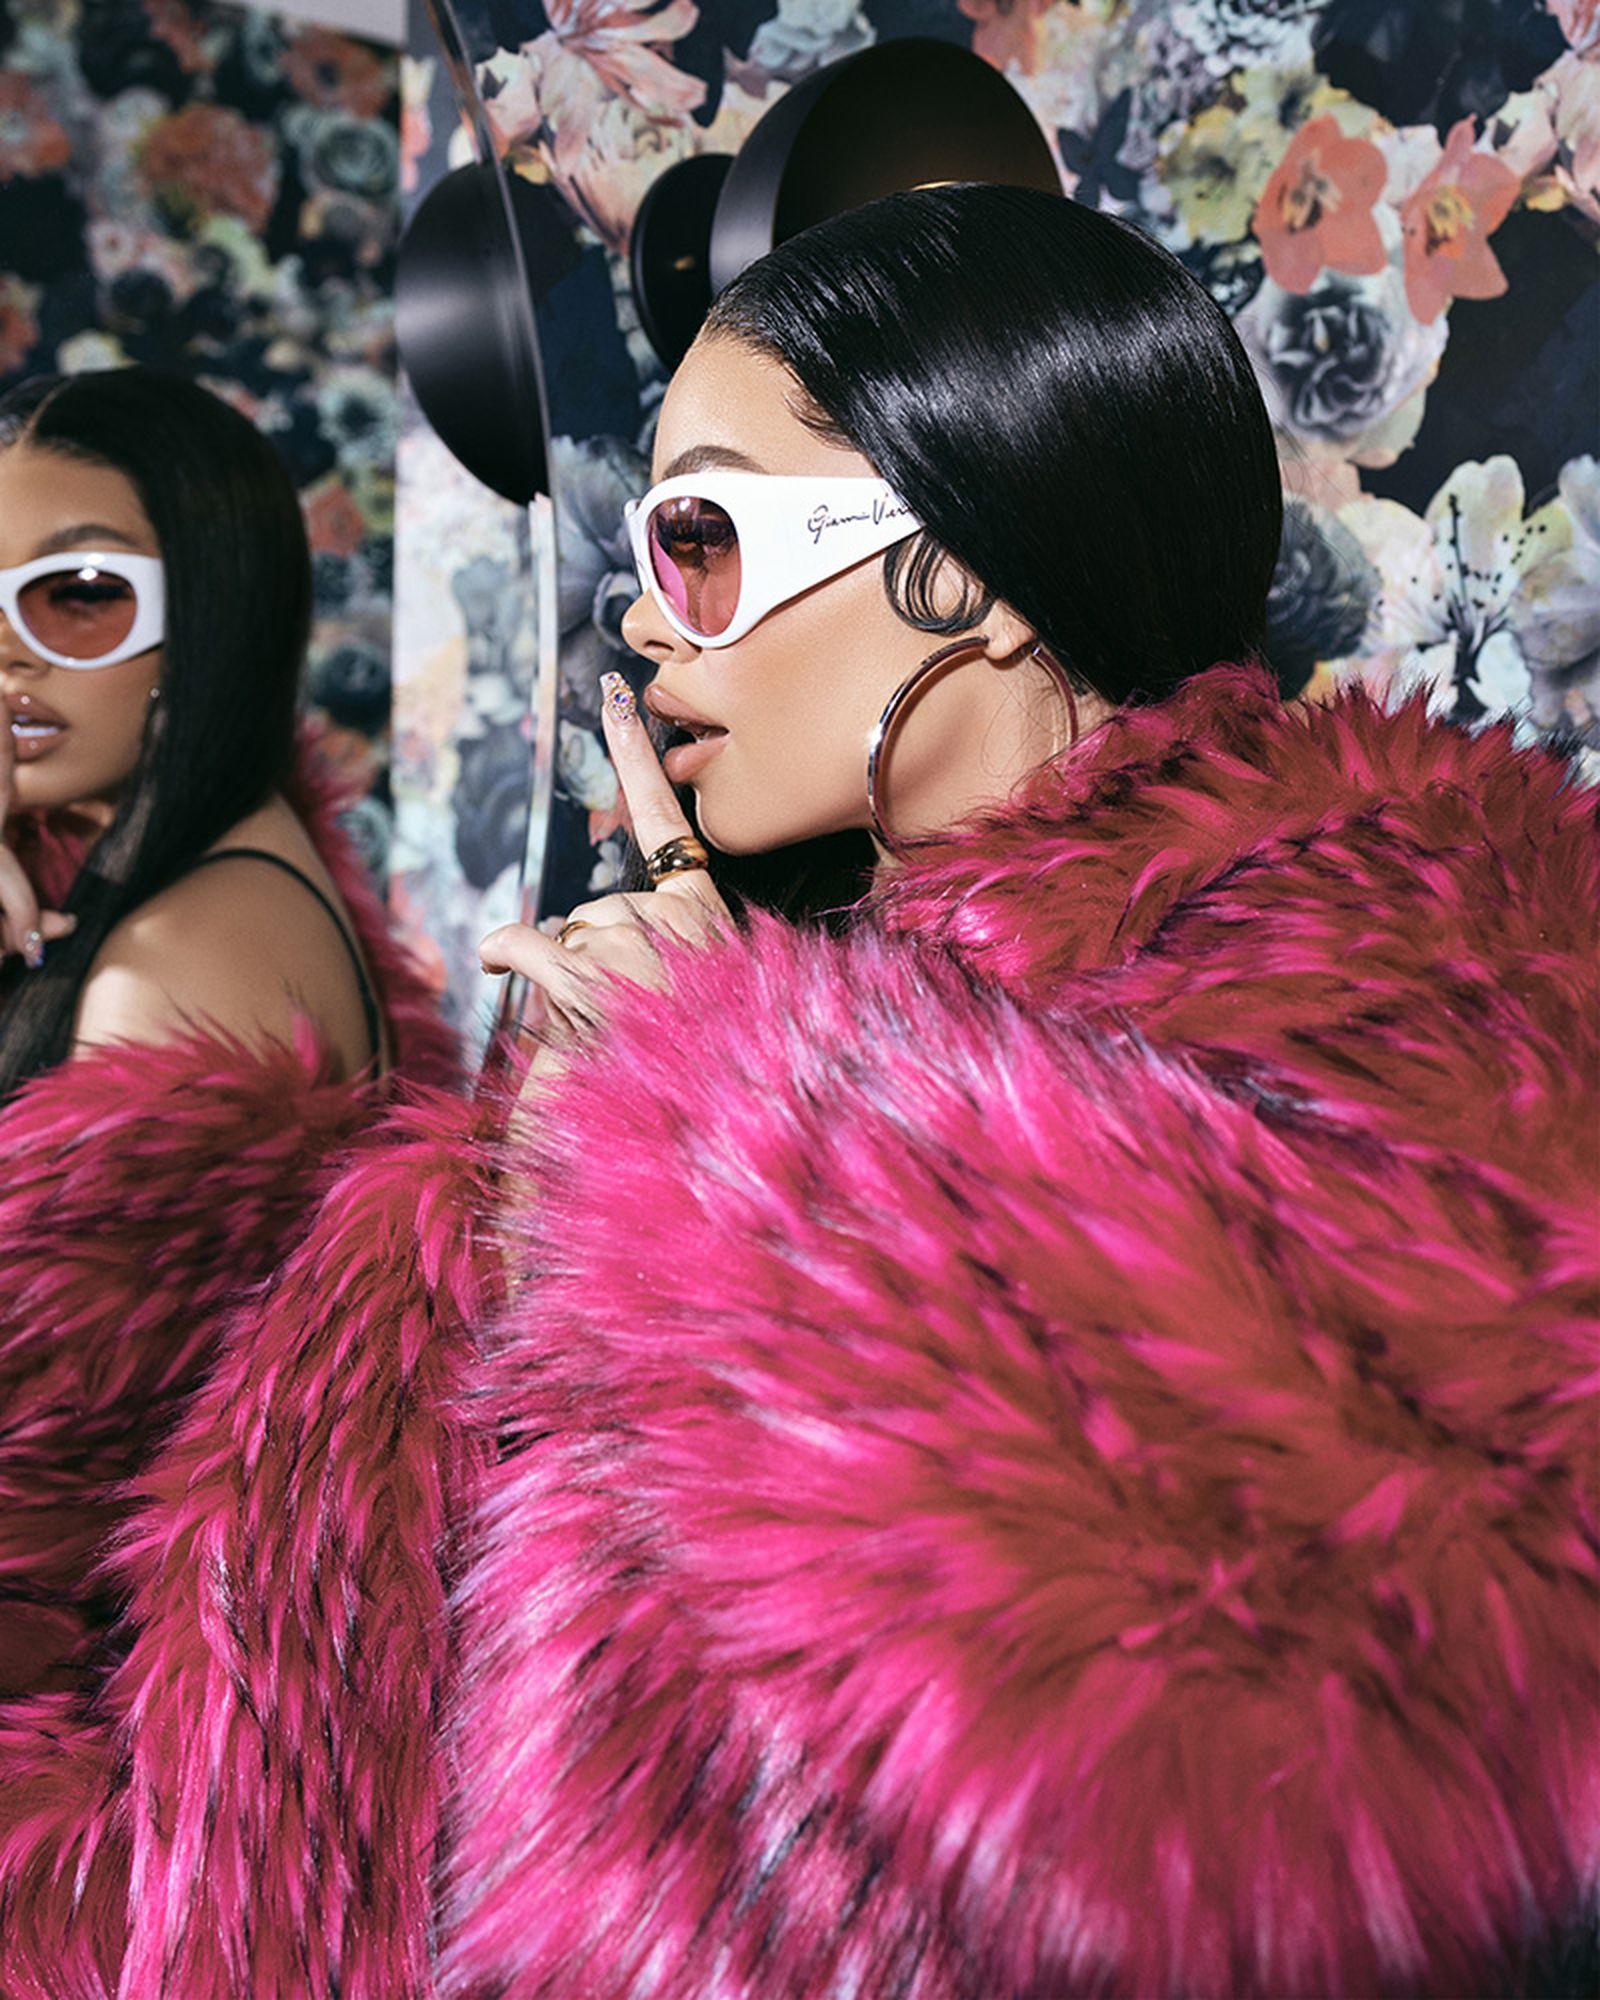 Coat DOLCE & GABBANA, Sunglasses VERSACE, Earrings SISTER LOVE MJB